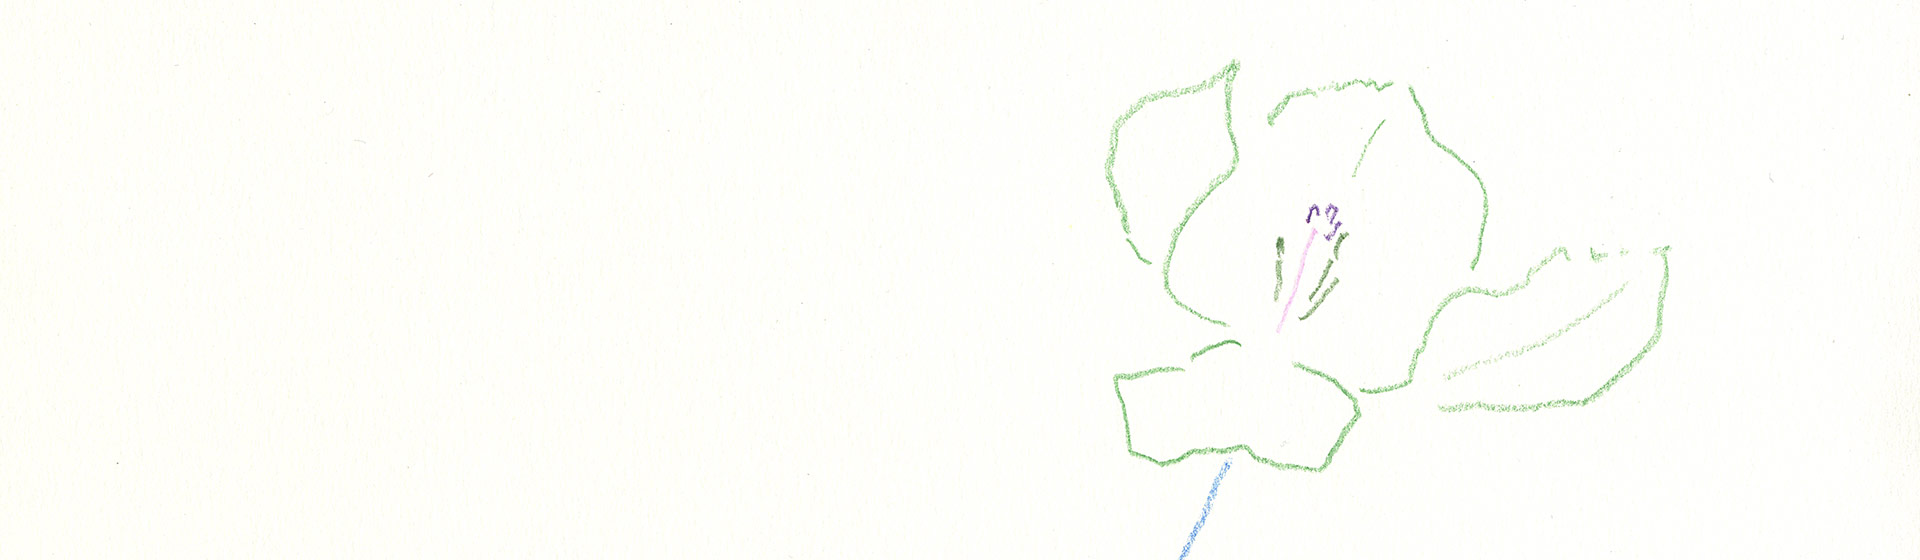 Raimer Jochims - Zeichnung